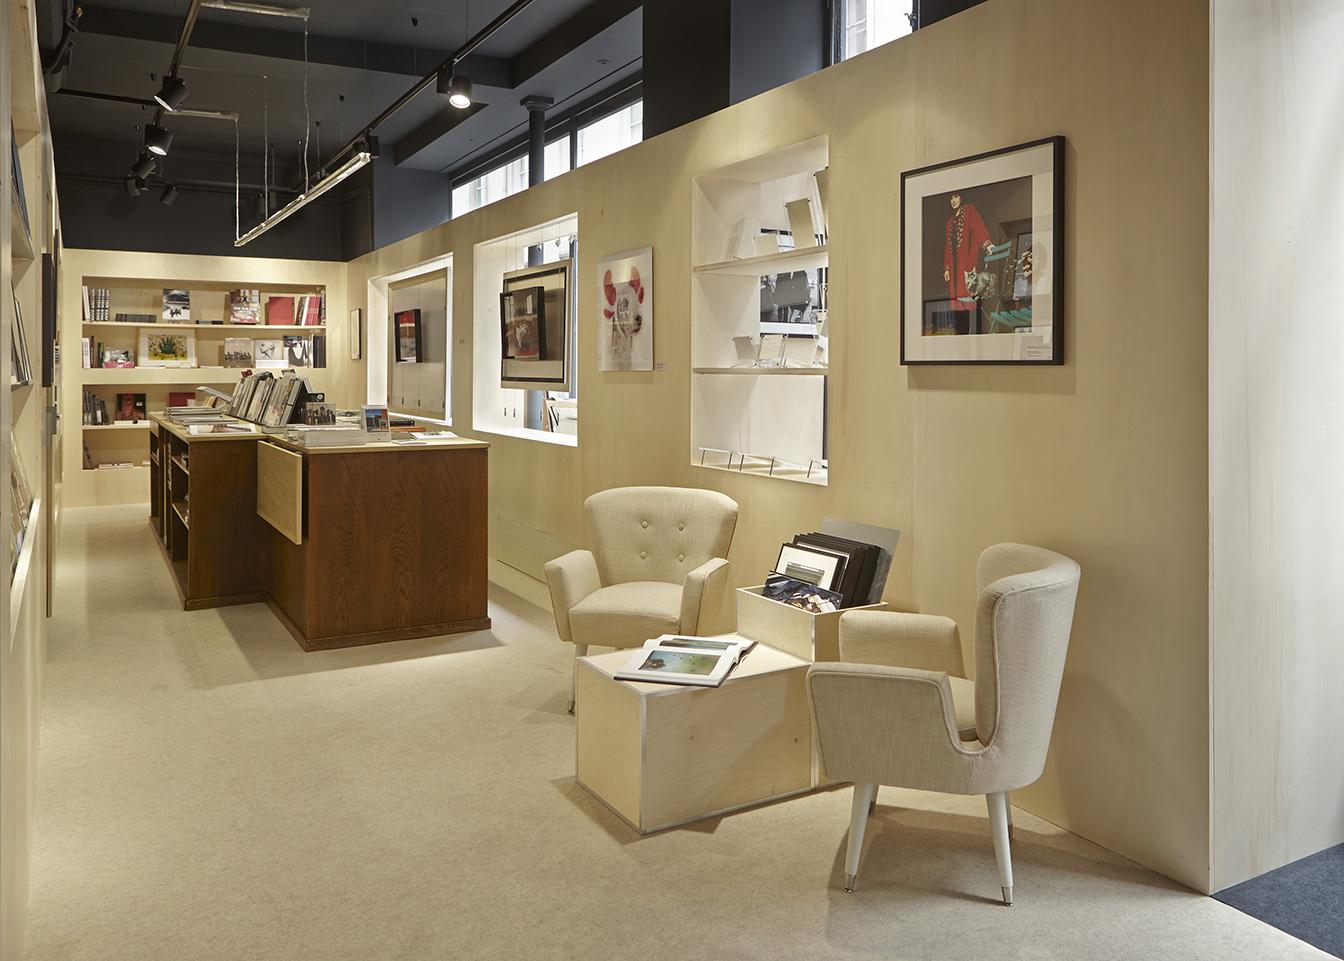 Galerie Bettina - Photo intérieur